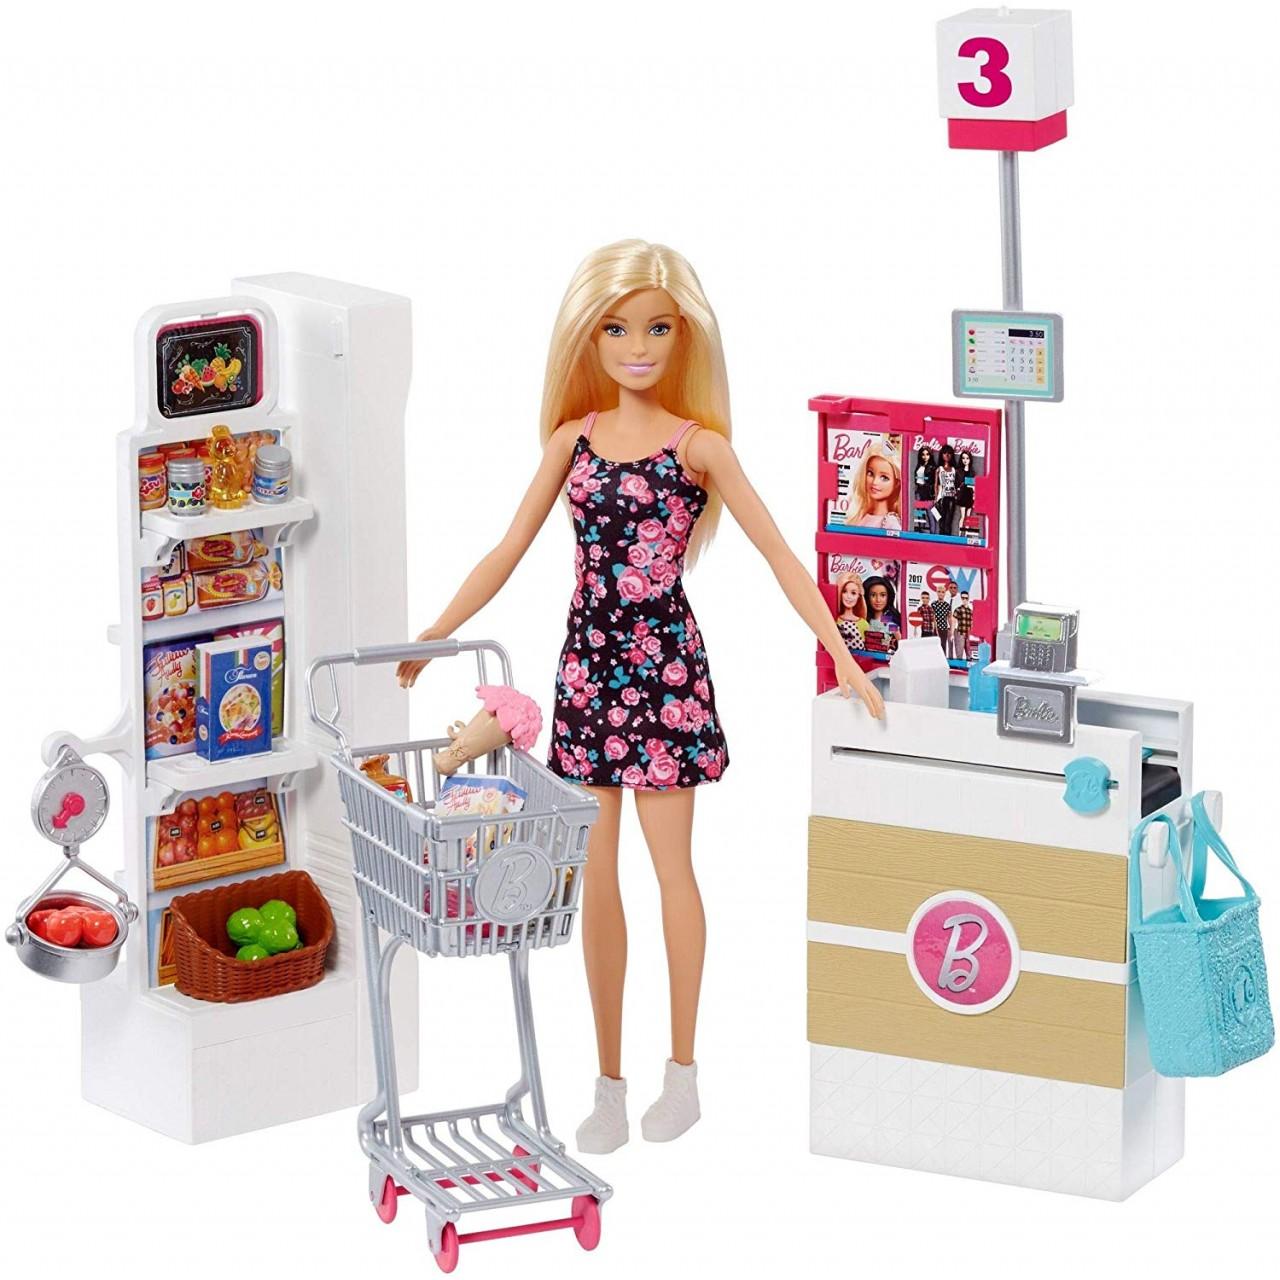 Набір лялька Барбі в Супермаркеті FRP01